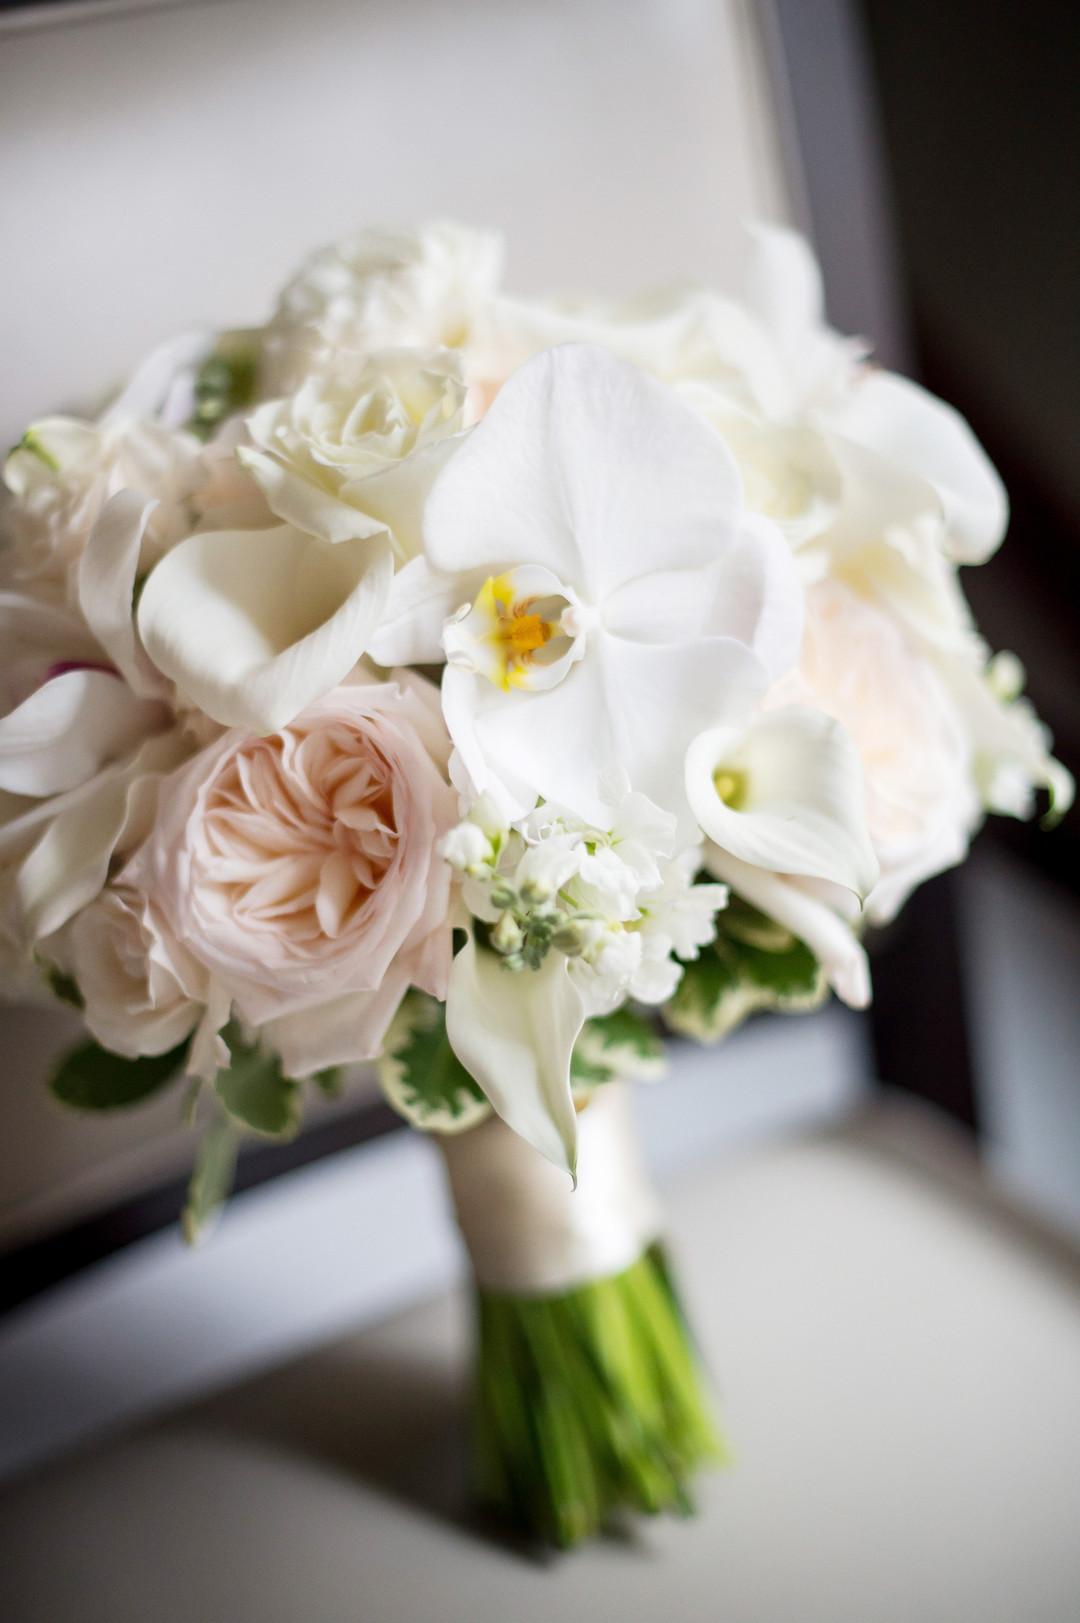 White and Ivory Bouquet Chicago Wedding Julia Franzosa Photography